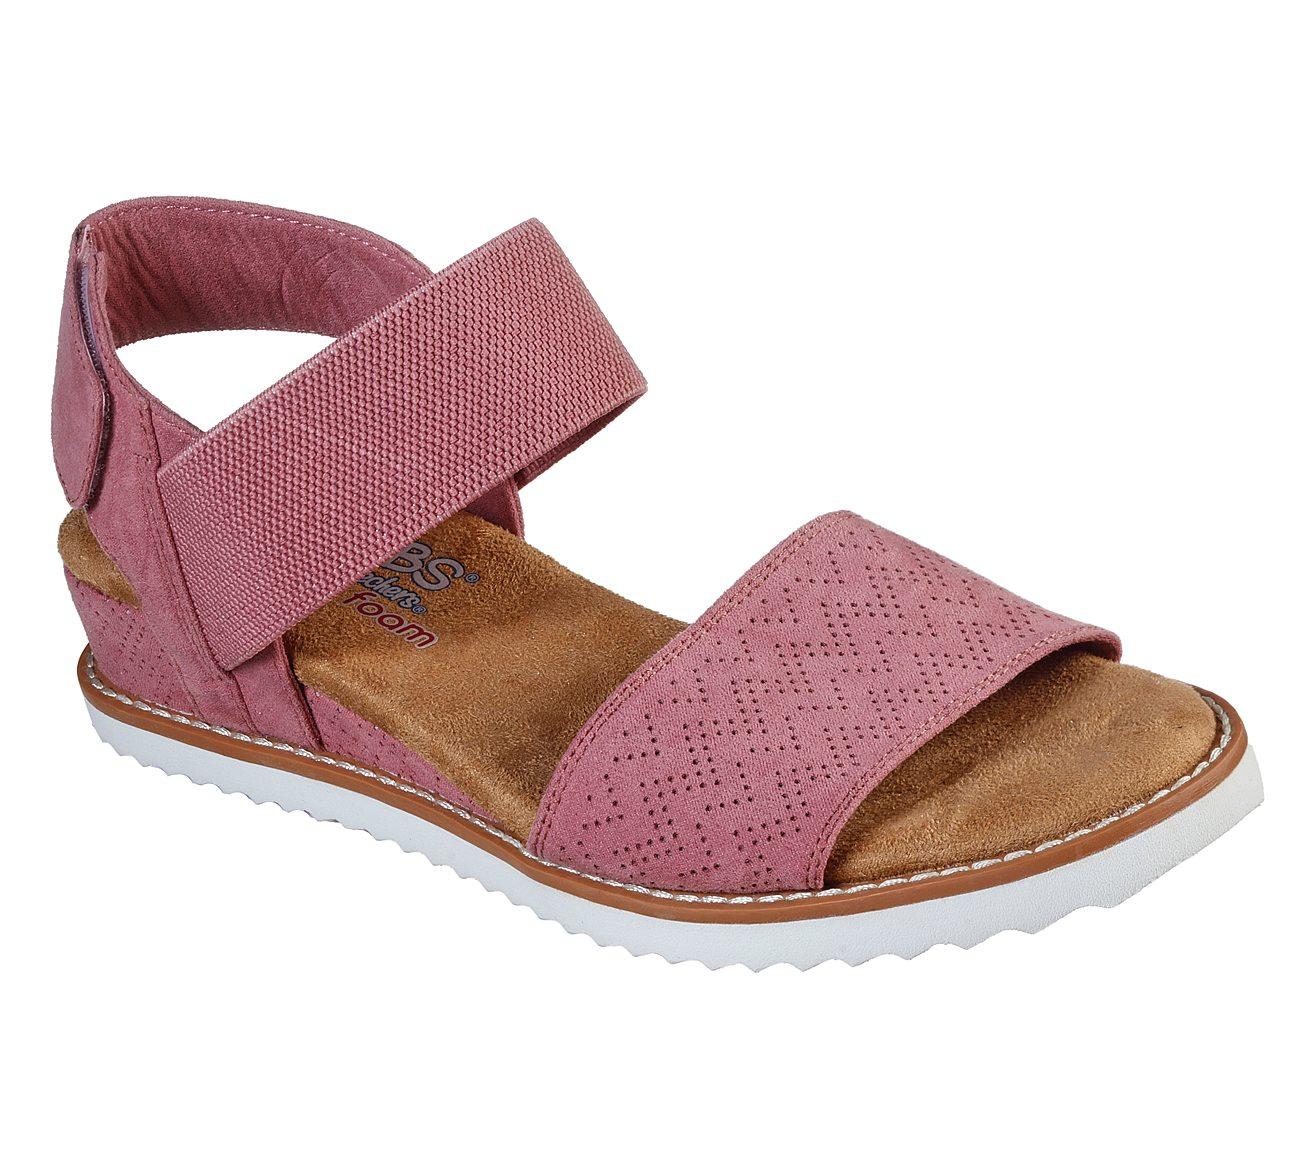 1df093556c48f Buy SKECHERS BOBS Desert Kiss BOBS Shoes only $42.00